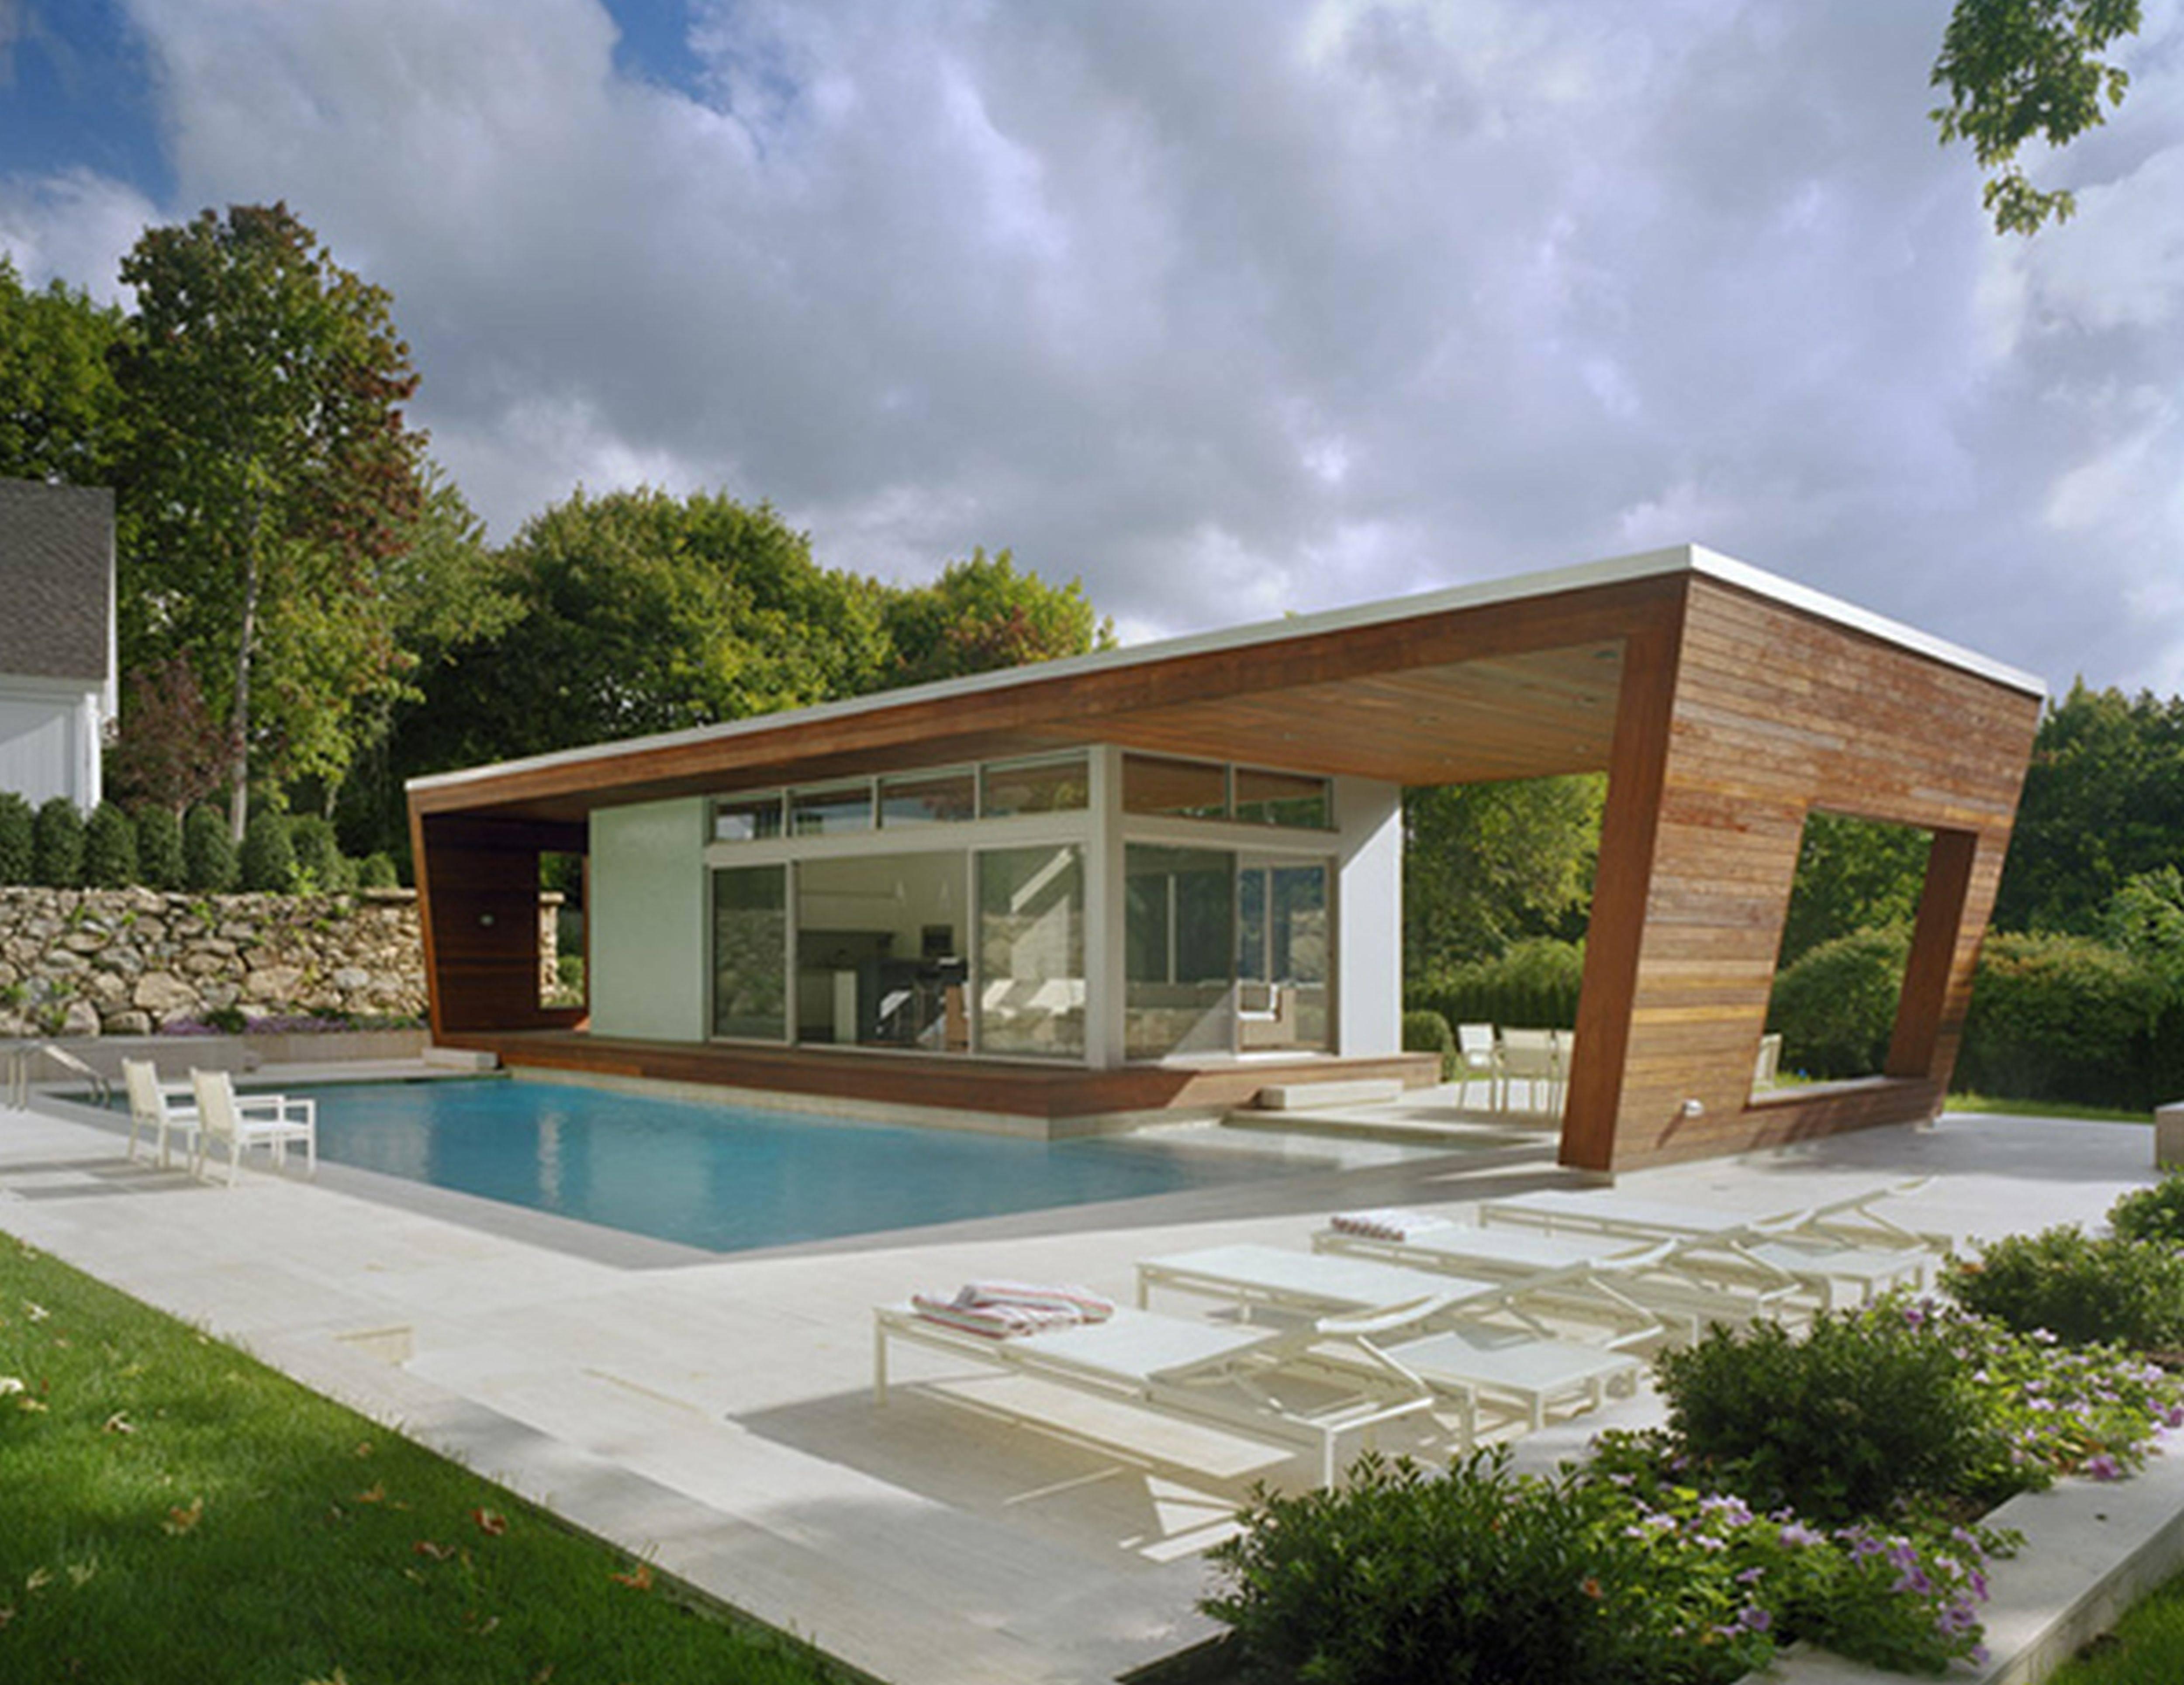 Bungalow House Floor Plan Modern ttic - House Plans #76624 - ^